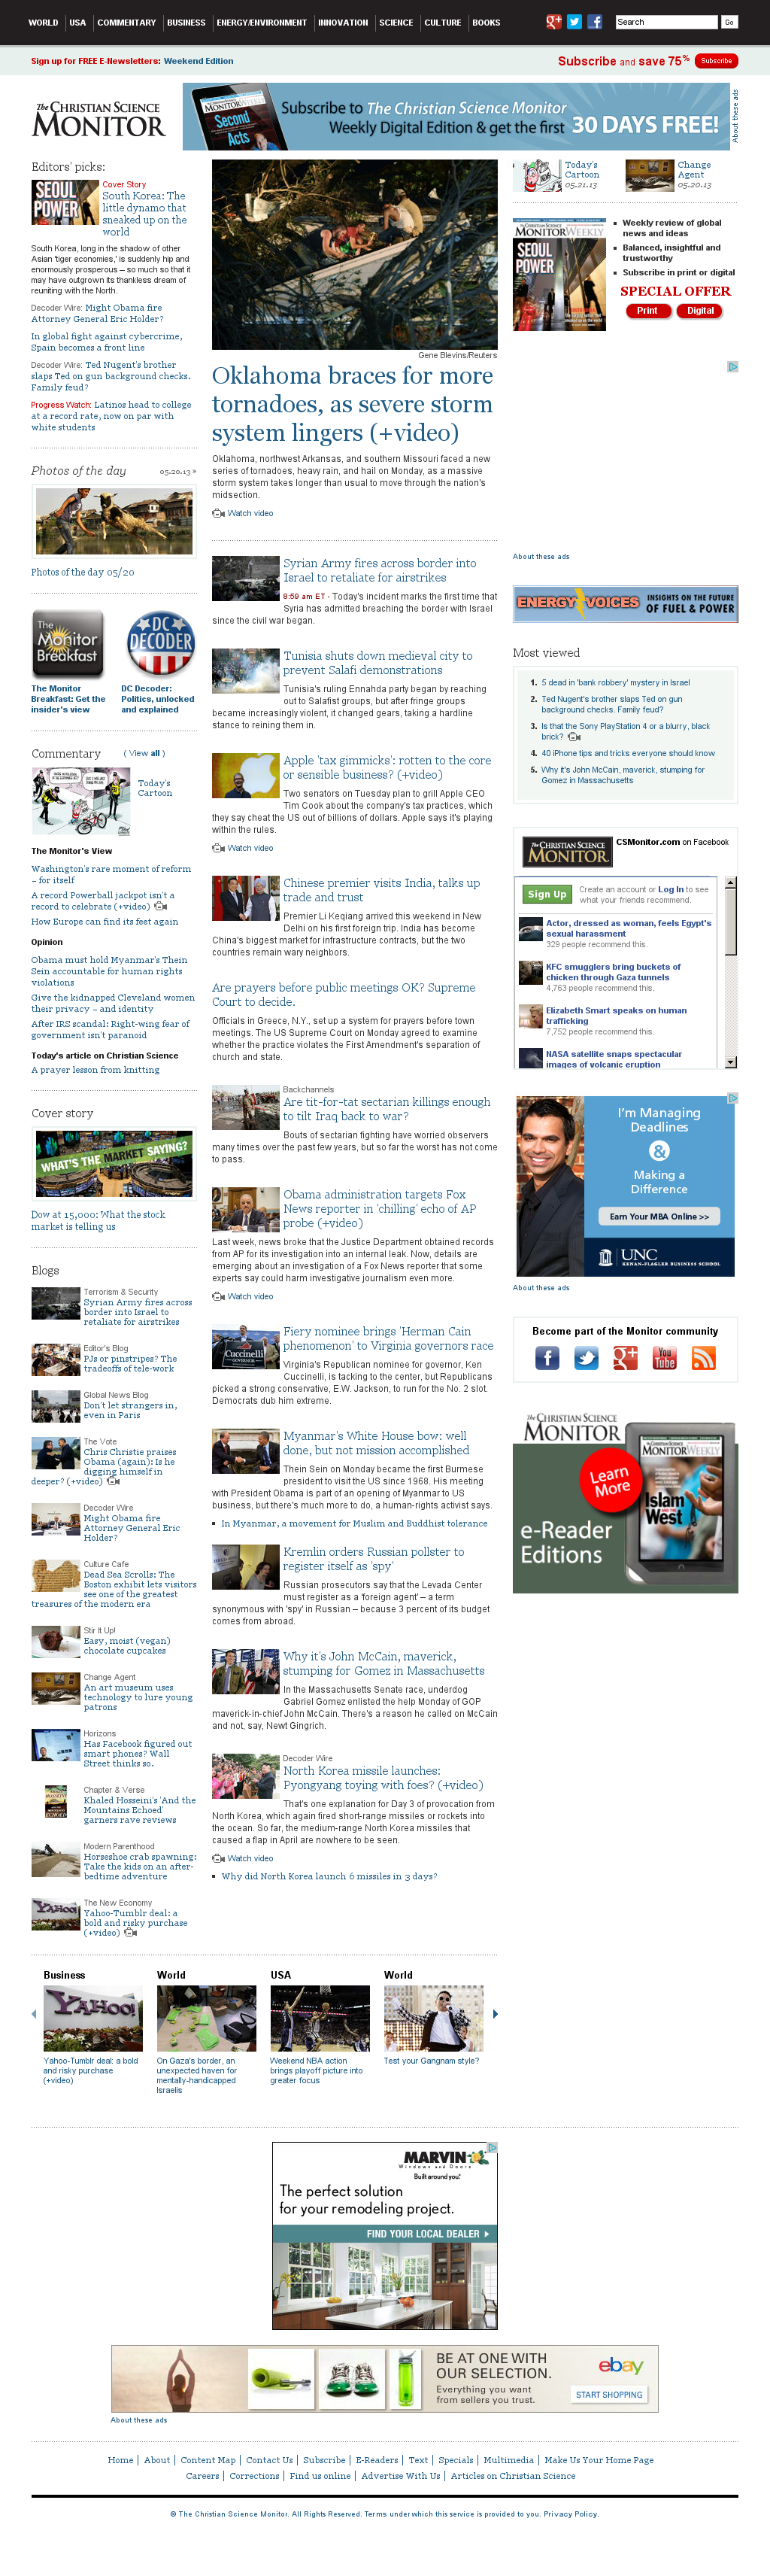 The Christian Science Monitor at Tuesday May 21, 2013, 1:03 p.m. UTC